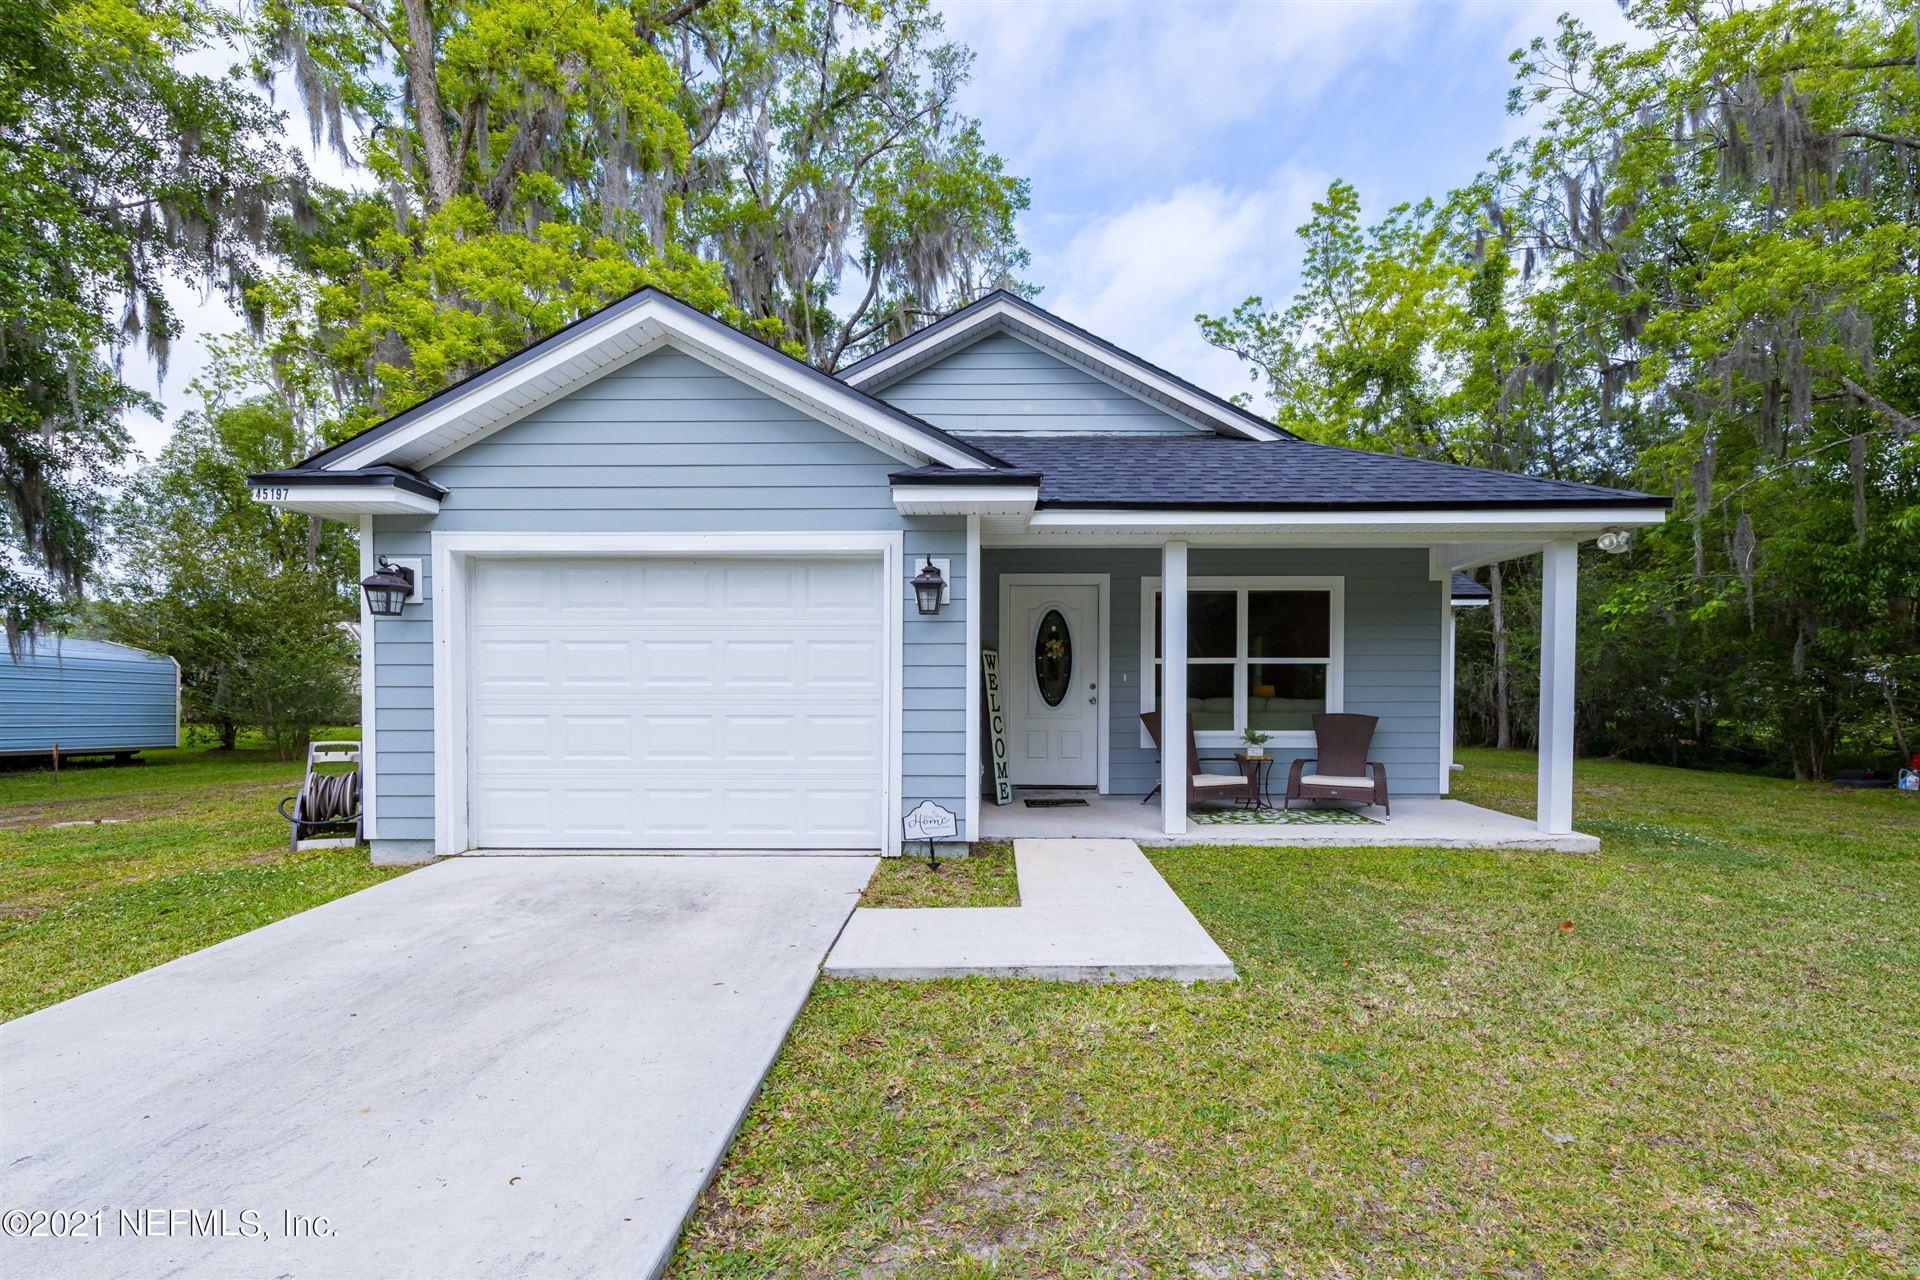 45197 GREEN AVE #Lot No: 5,8, Callahan, FL 32011 - MLS#: 1107799